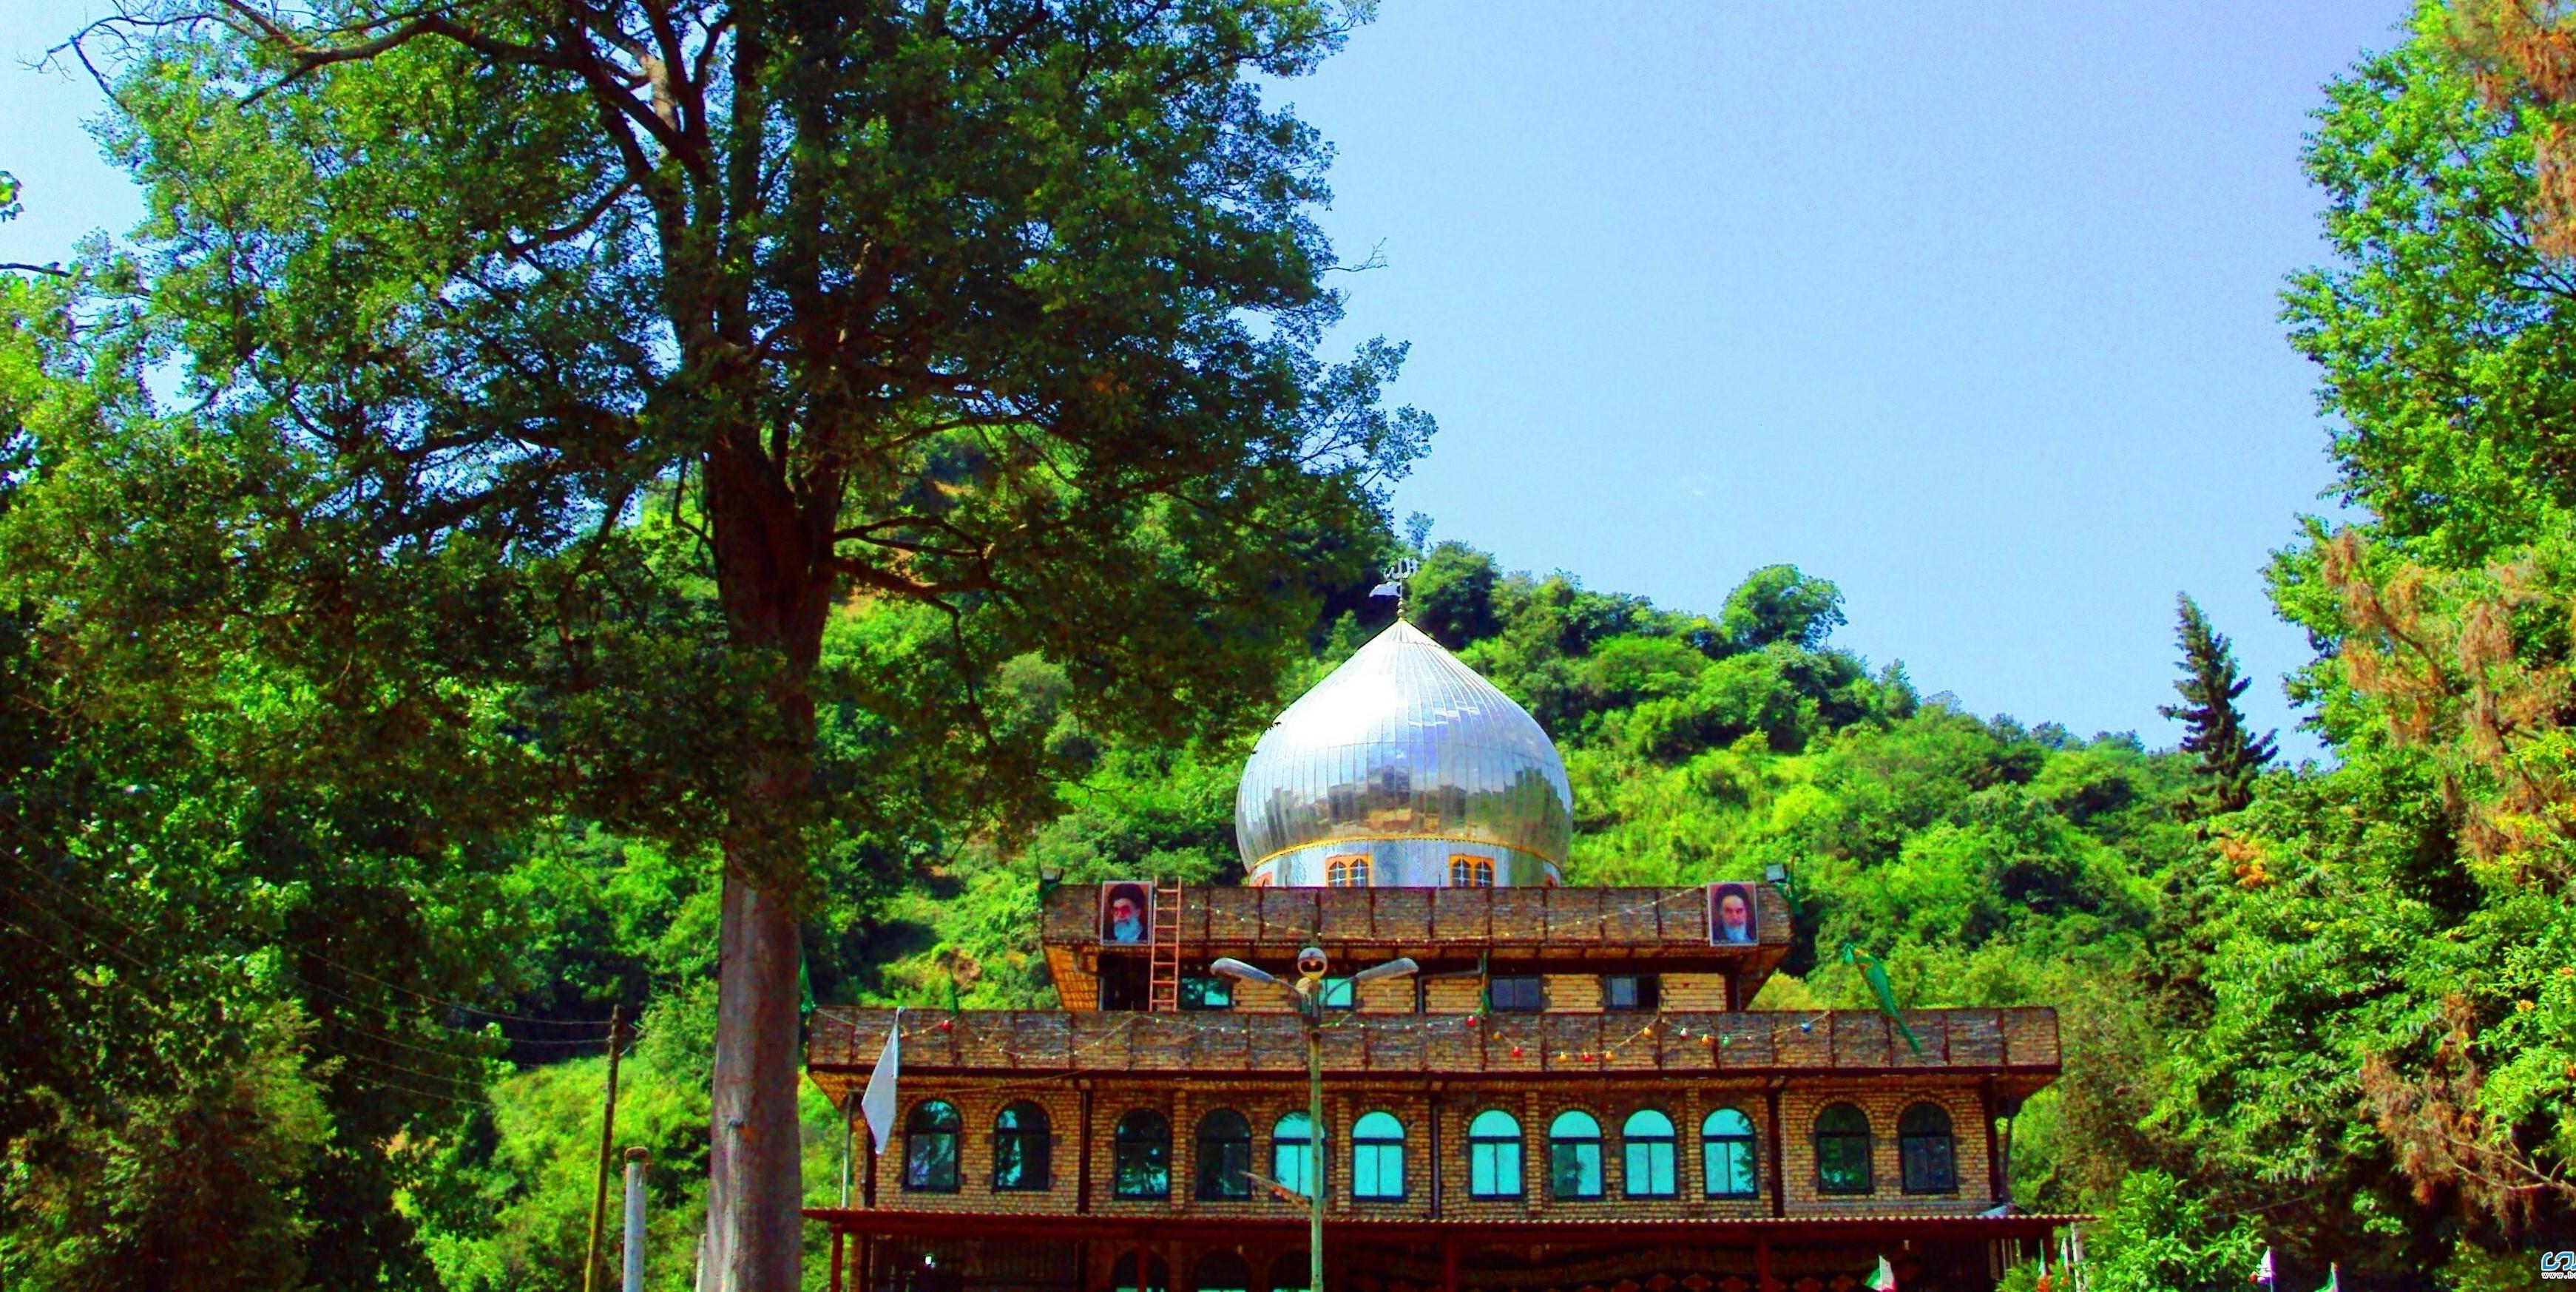 Hamgardi 2746iwwlp9C - لنگرود شهر زیبا و سرسبز گیلان | Gilan